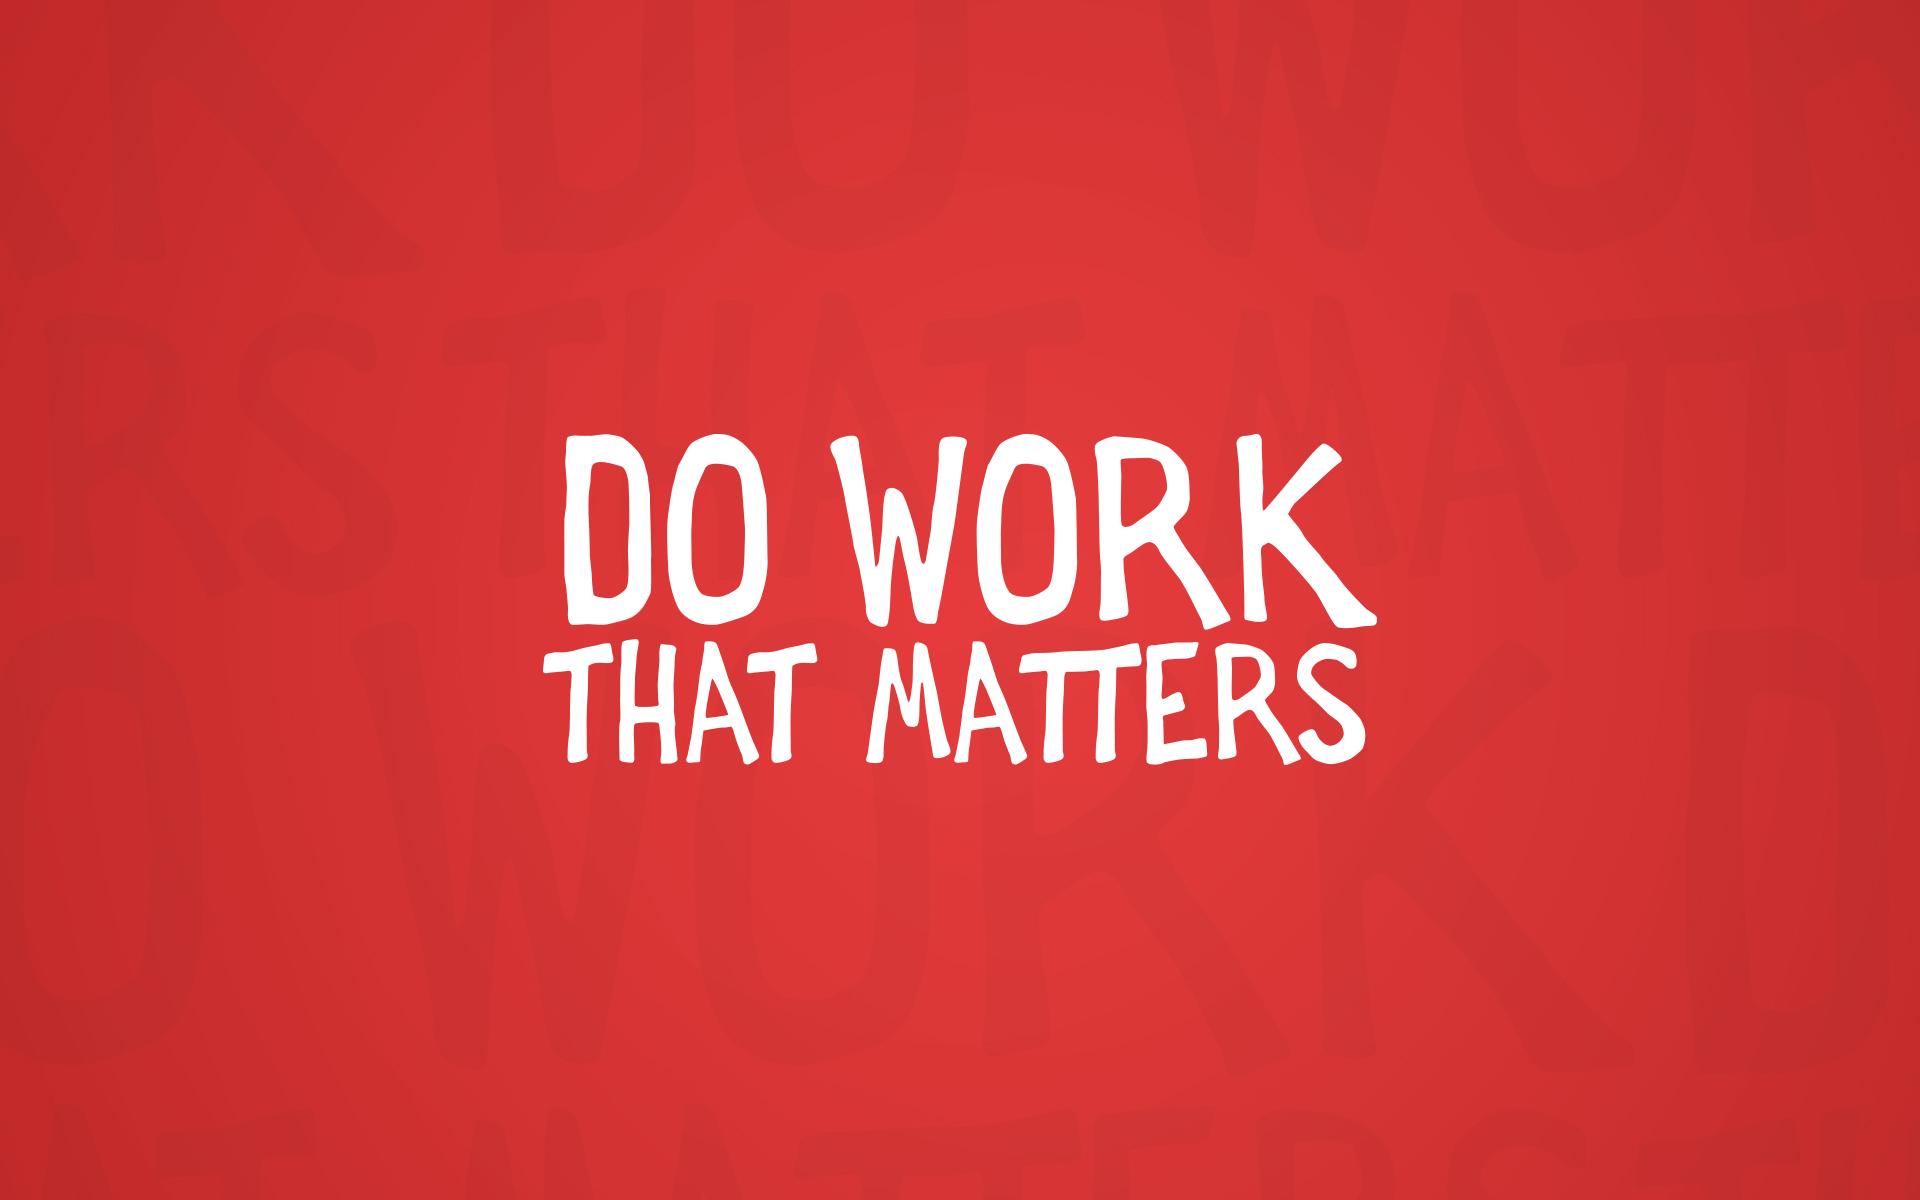 start matters social wallpaper create images dramsey daveramsey 1920x1200